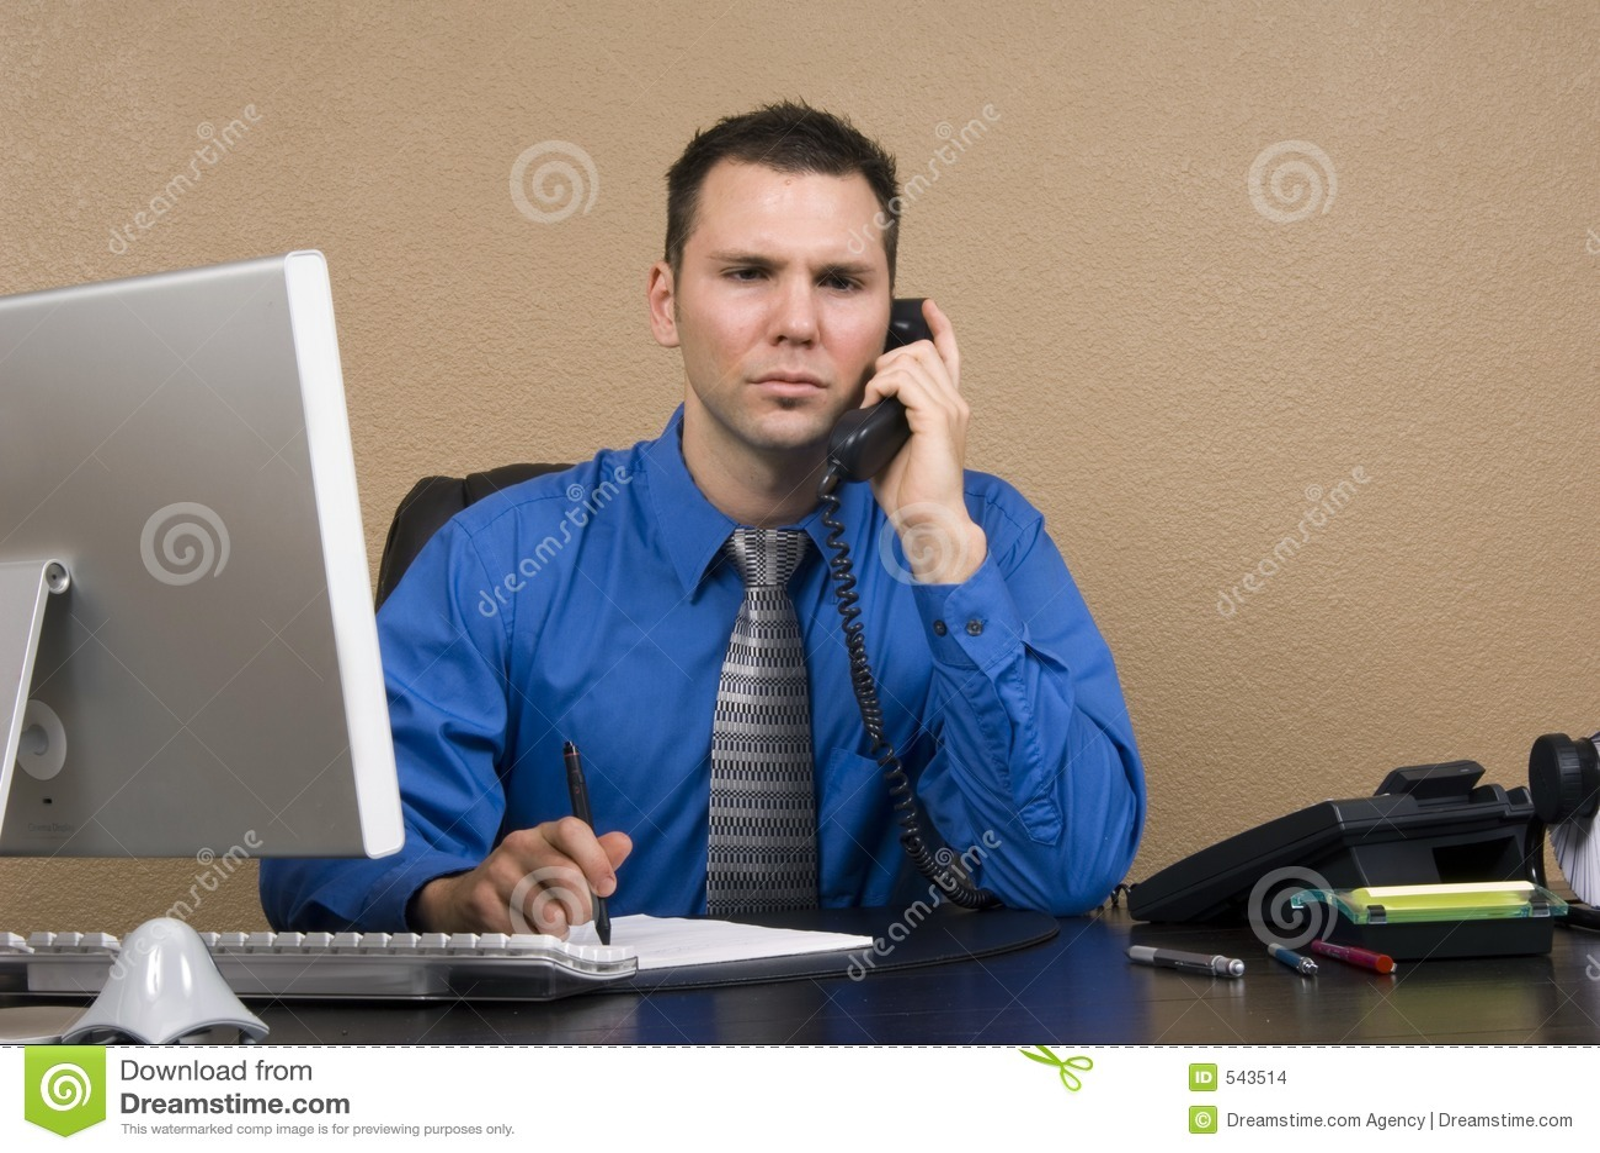 Download 商业他的人办公室 库存照片. 图片 包括有 工作, 交谈, 关系, 商业, 白种人, 计划, 电话, 执行委员 - 543514